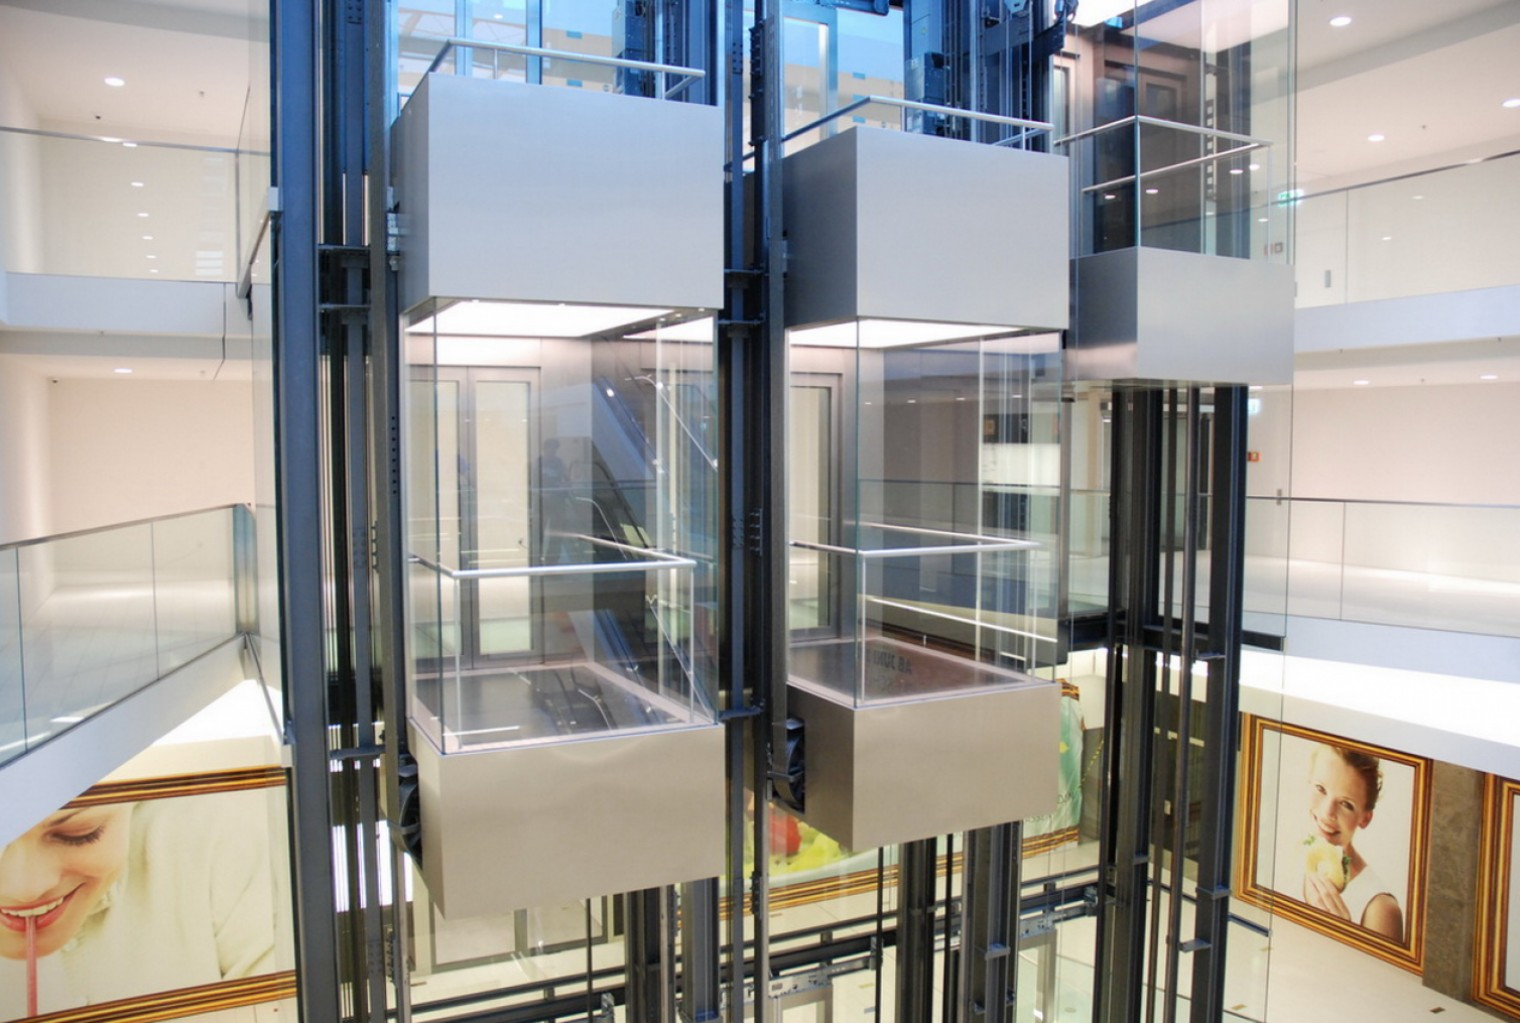 uphoff innovativ innovationen in stahl und glas. Black Bedroom Furniture Sets. Home Design Ideas